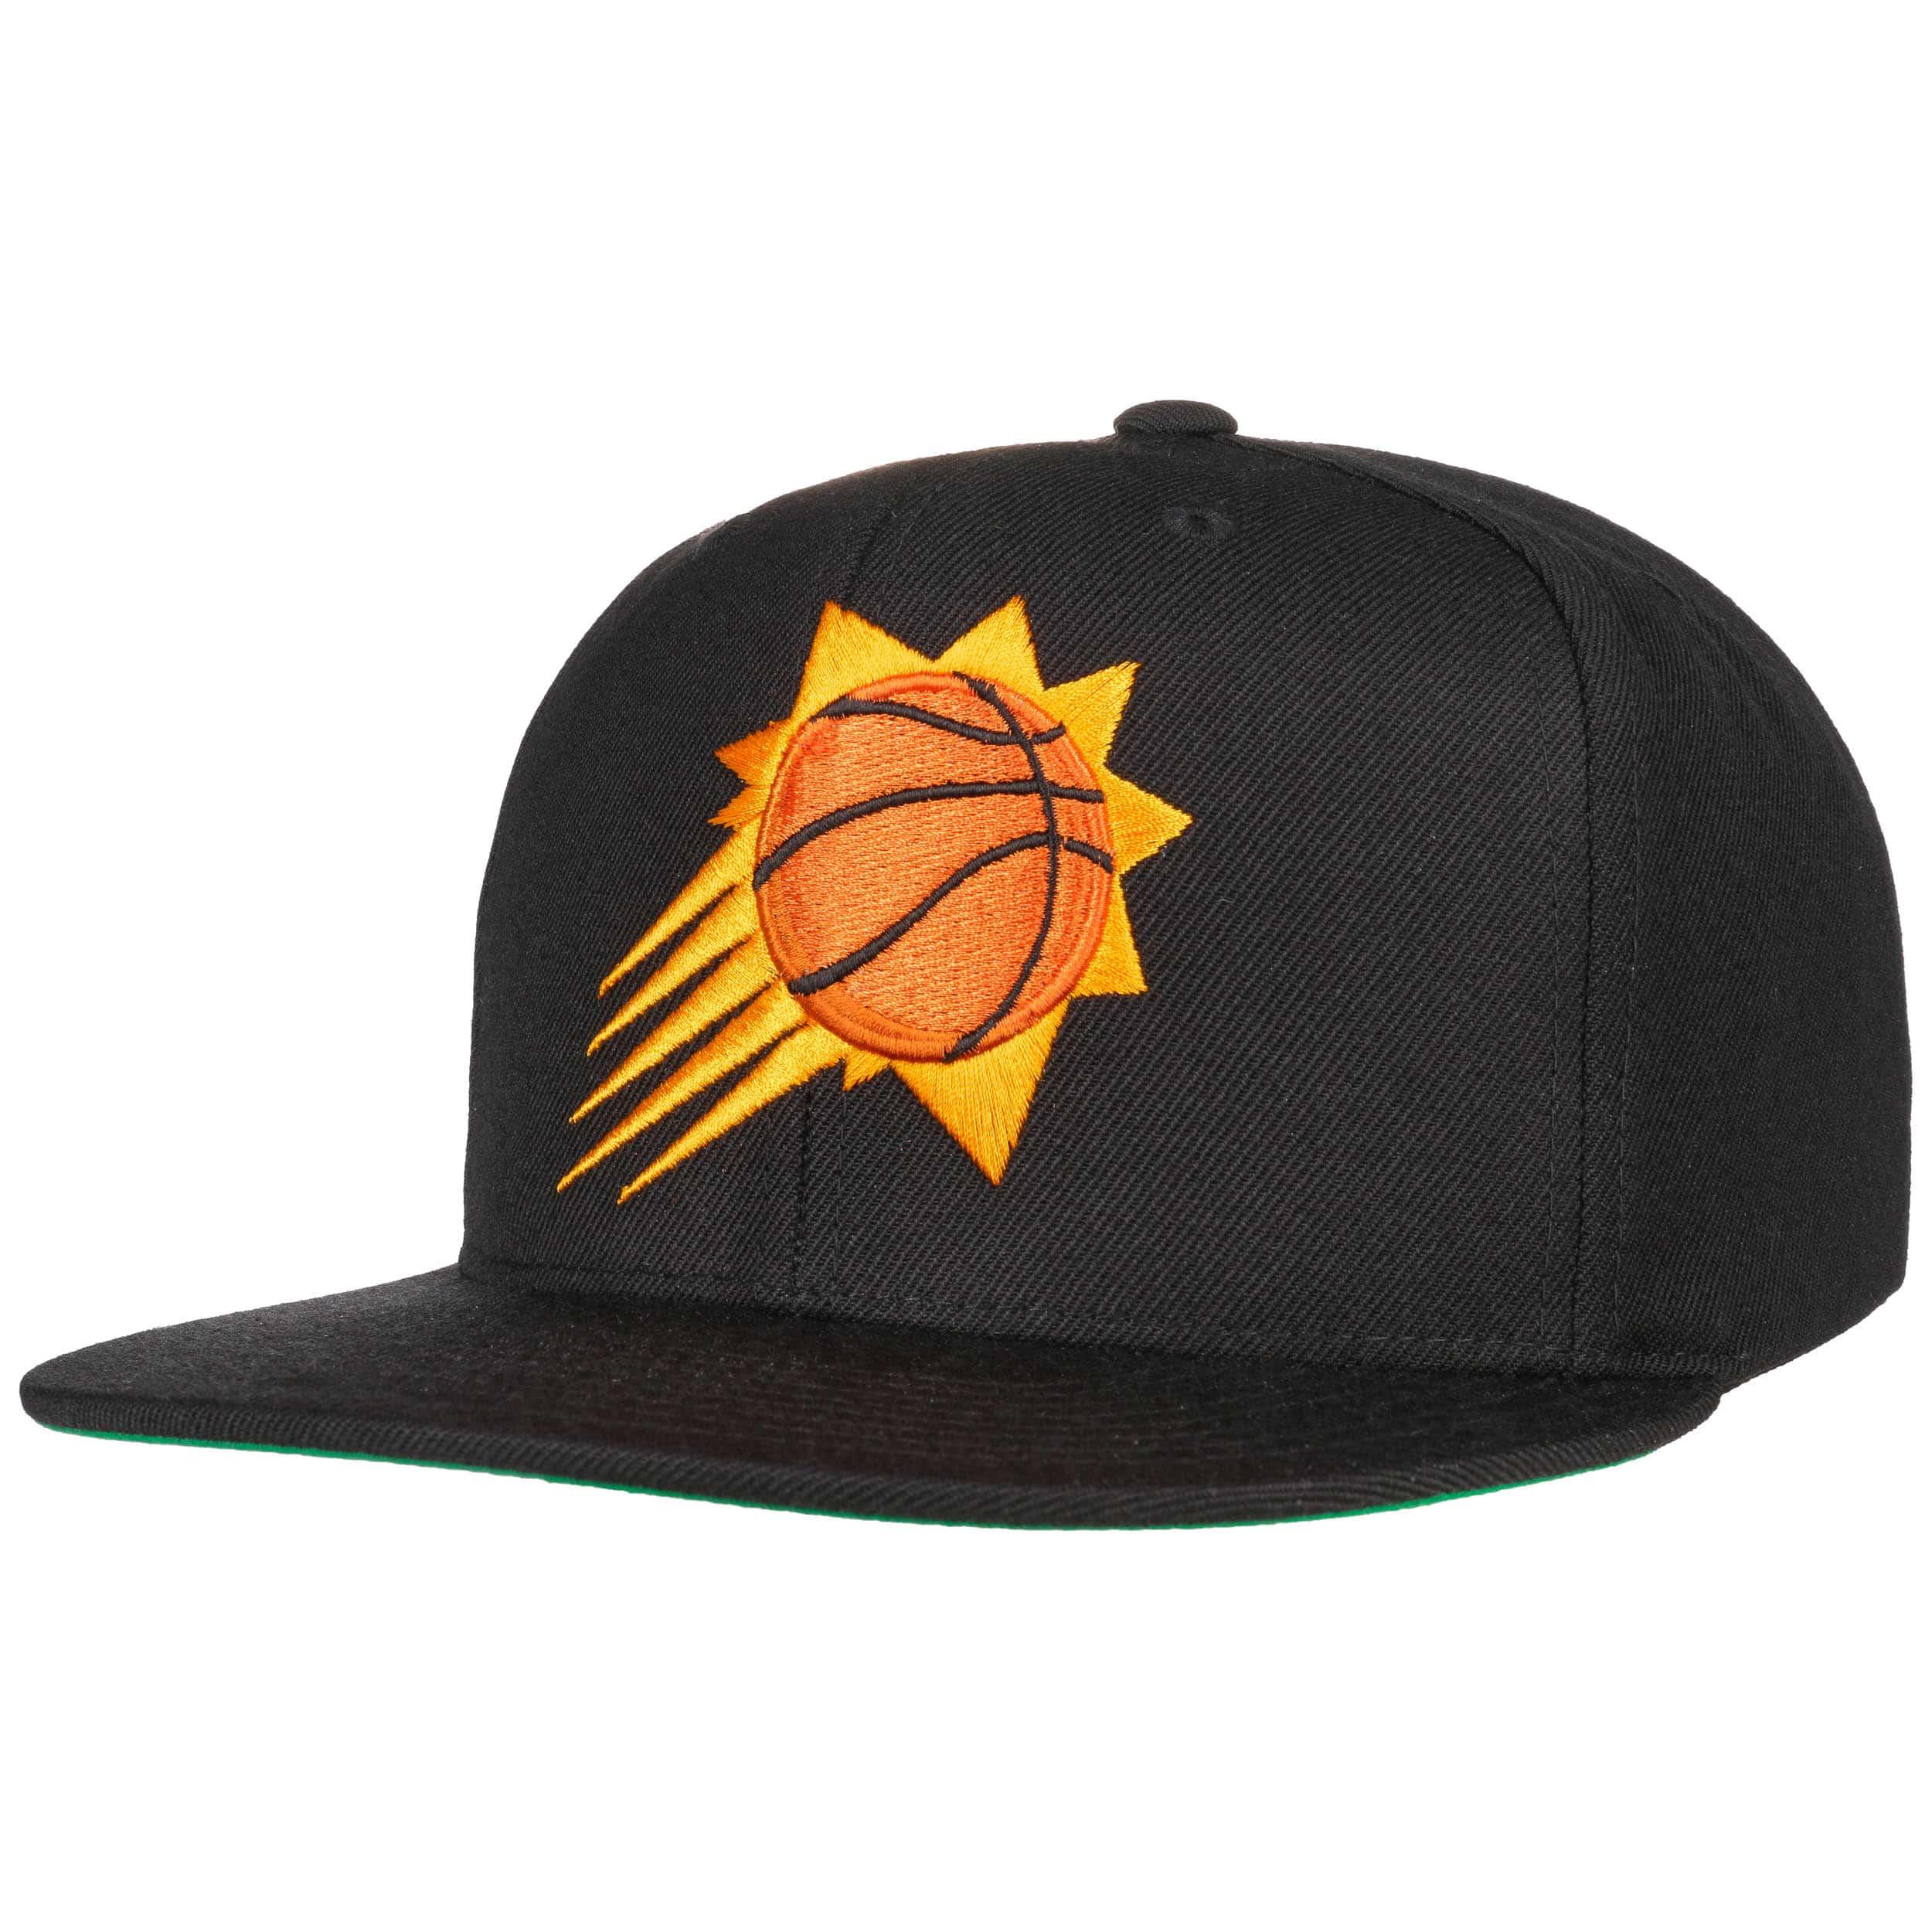 buy online 4630e c0eca Wool Suns Cap by Mitchell & Ness